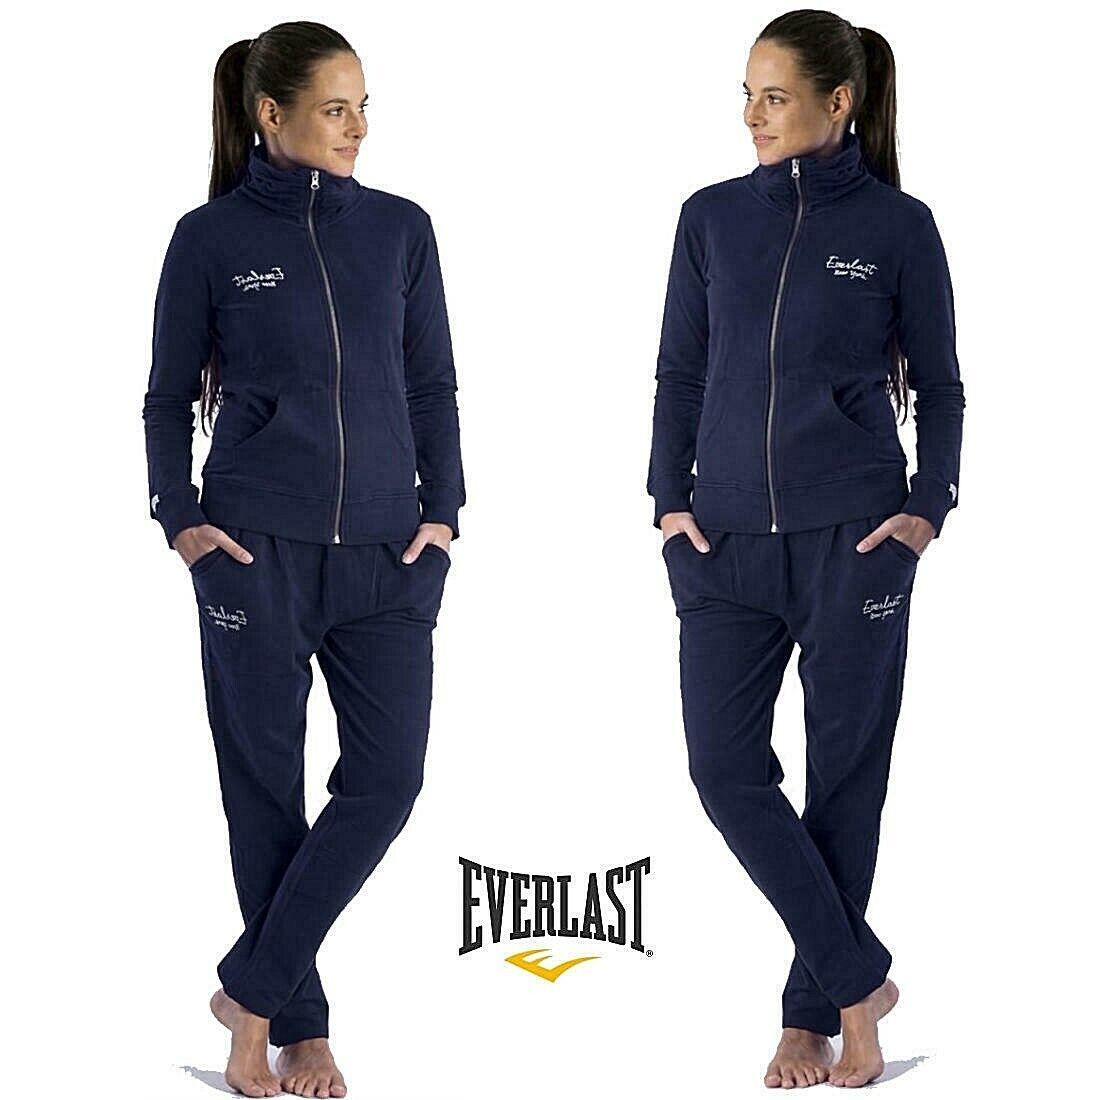 TUTA DONNA SPORT completo EVERLAST sportivo giacca zip